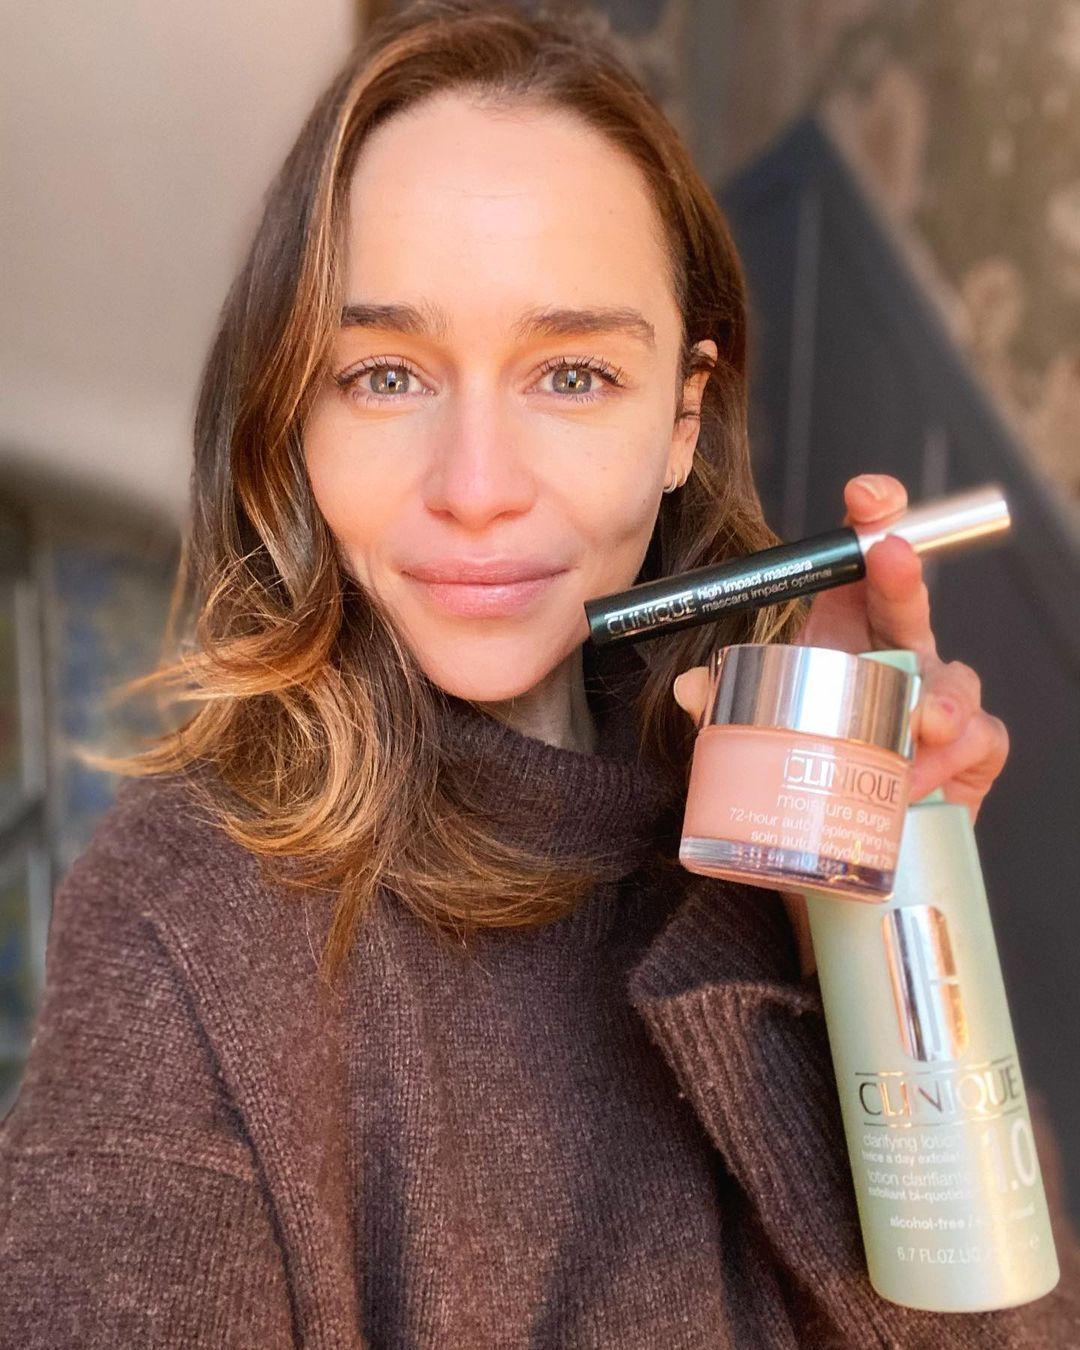 Emilia Clarke with Clinique skincare